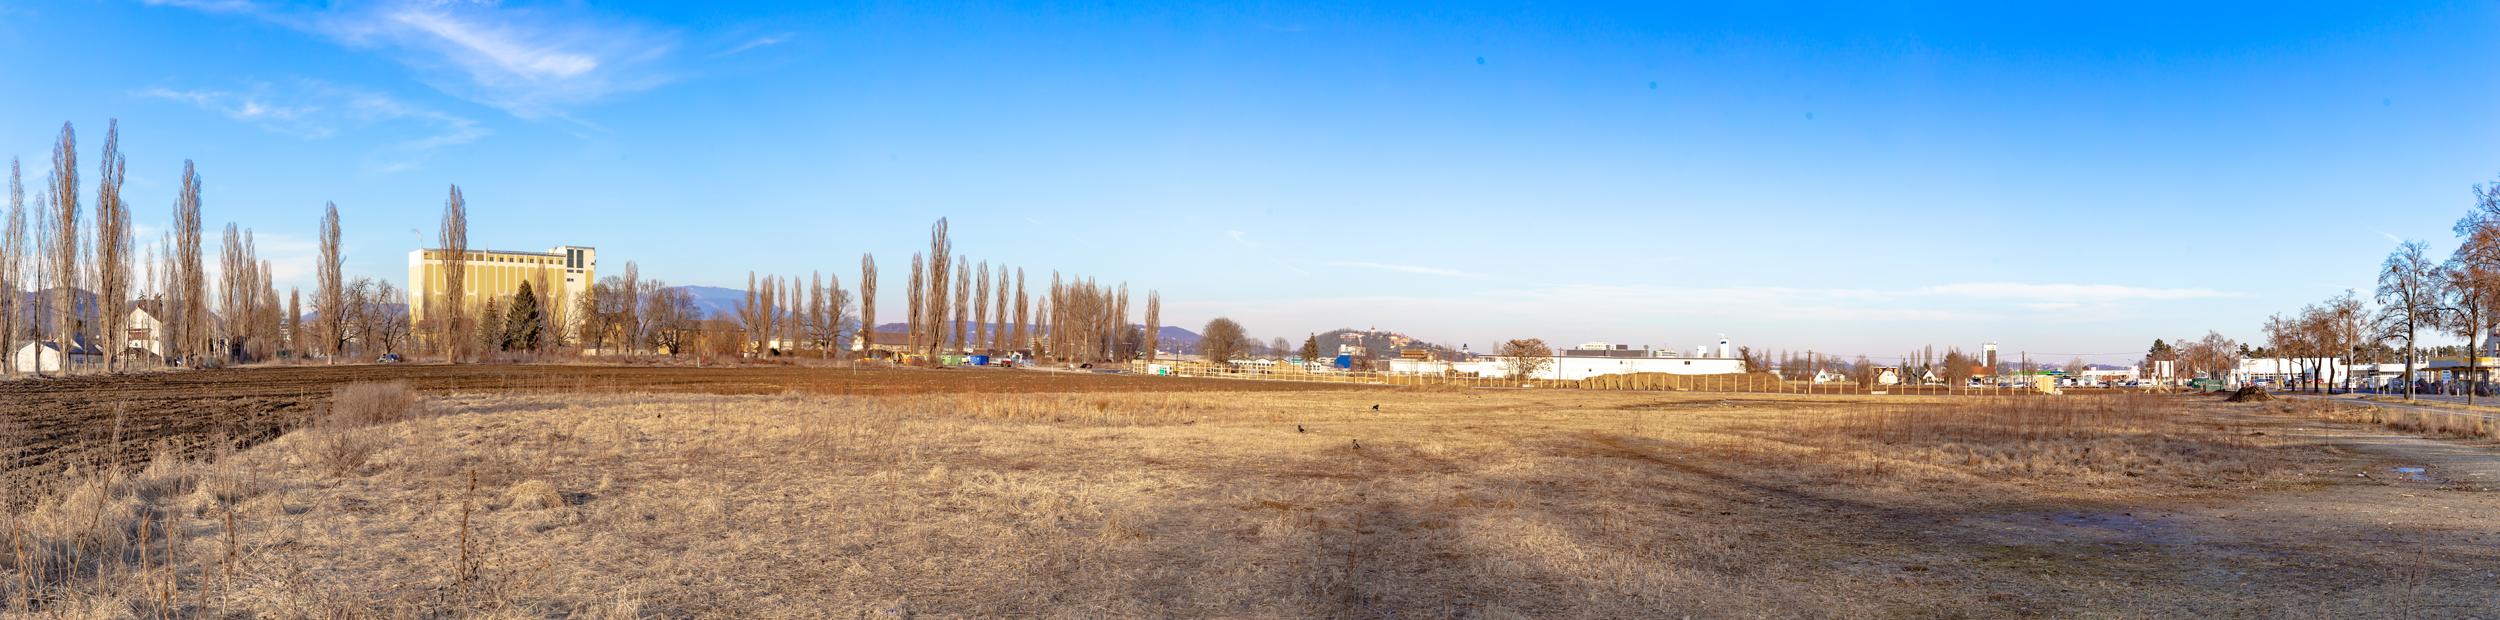 Reininghauspanorama von Südwesten, 09.02.2019